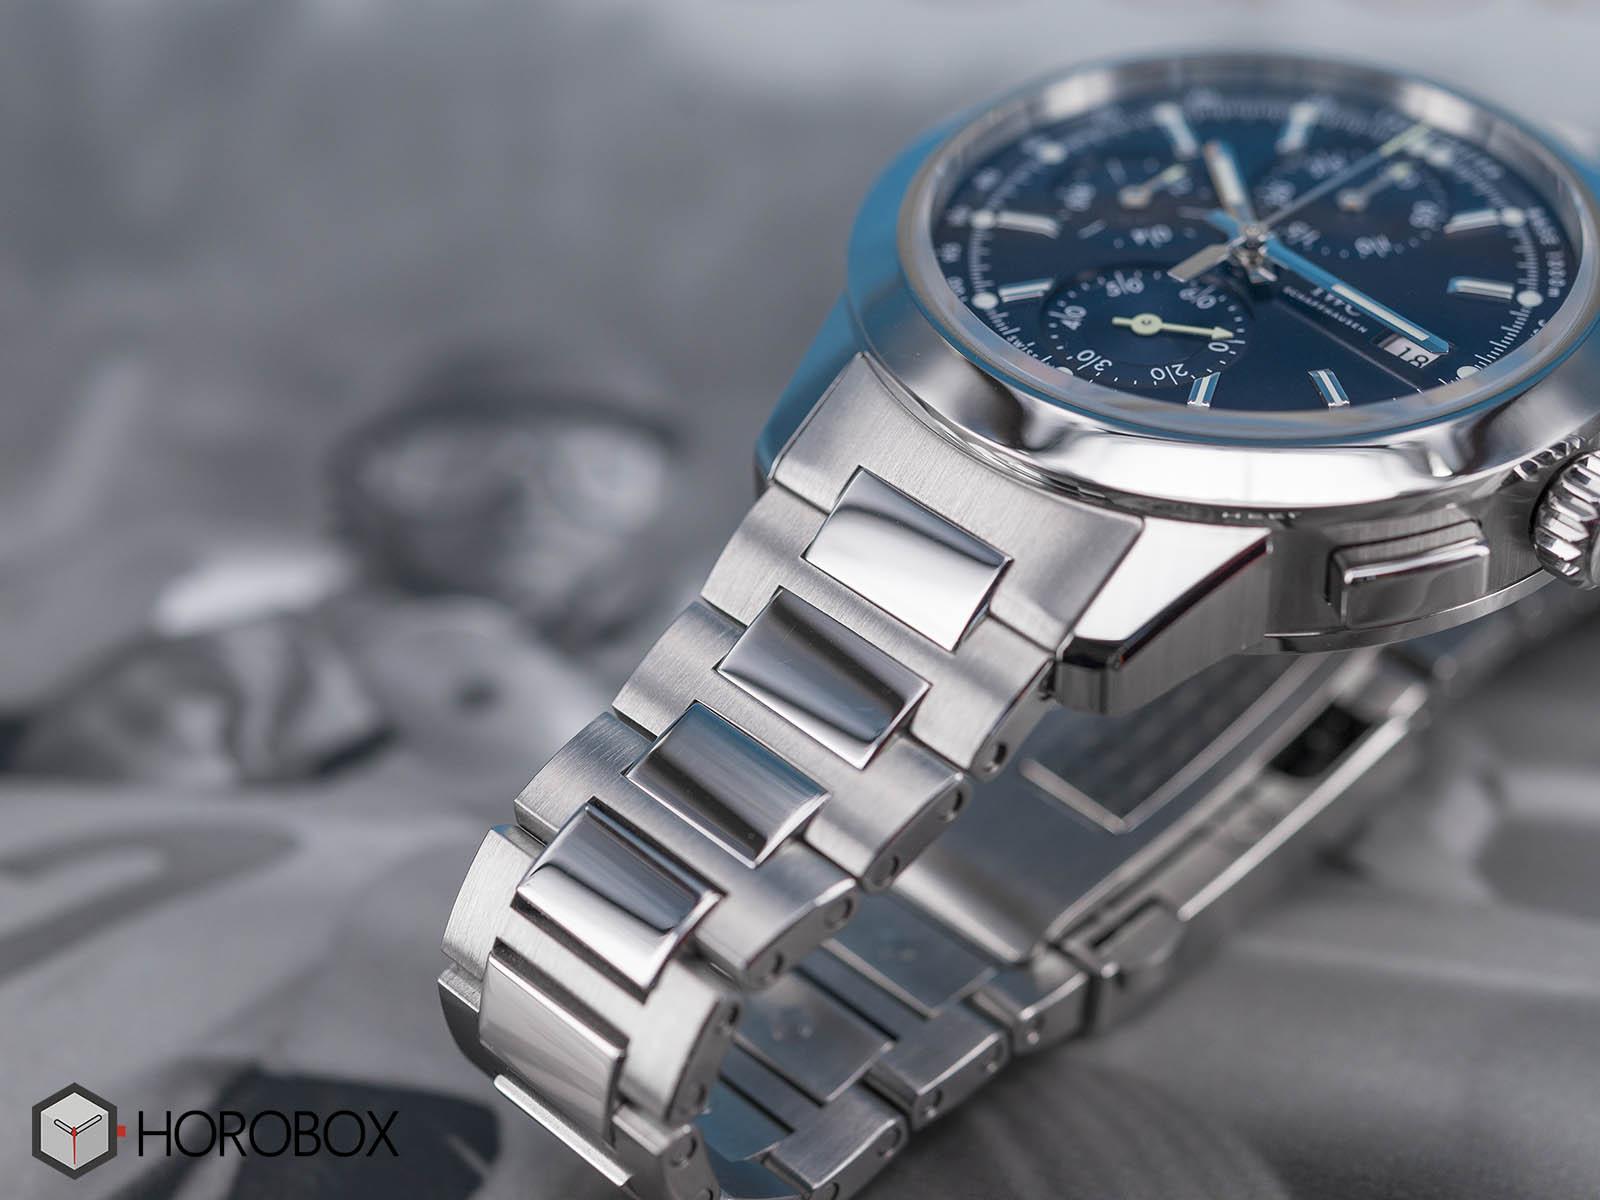 iwc-ingenieur-chronograph-W380802-8-.jpg